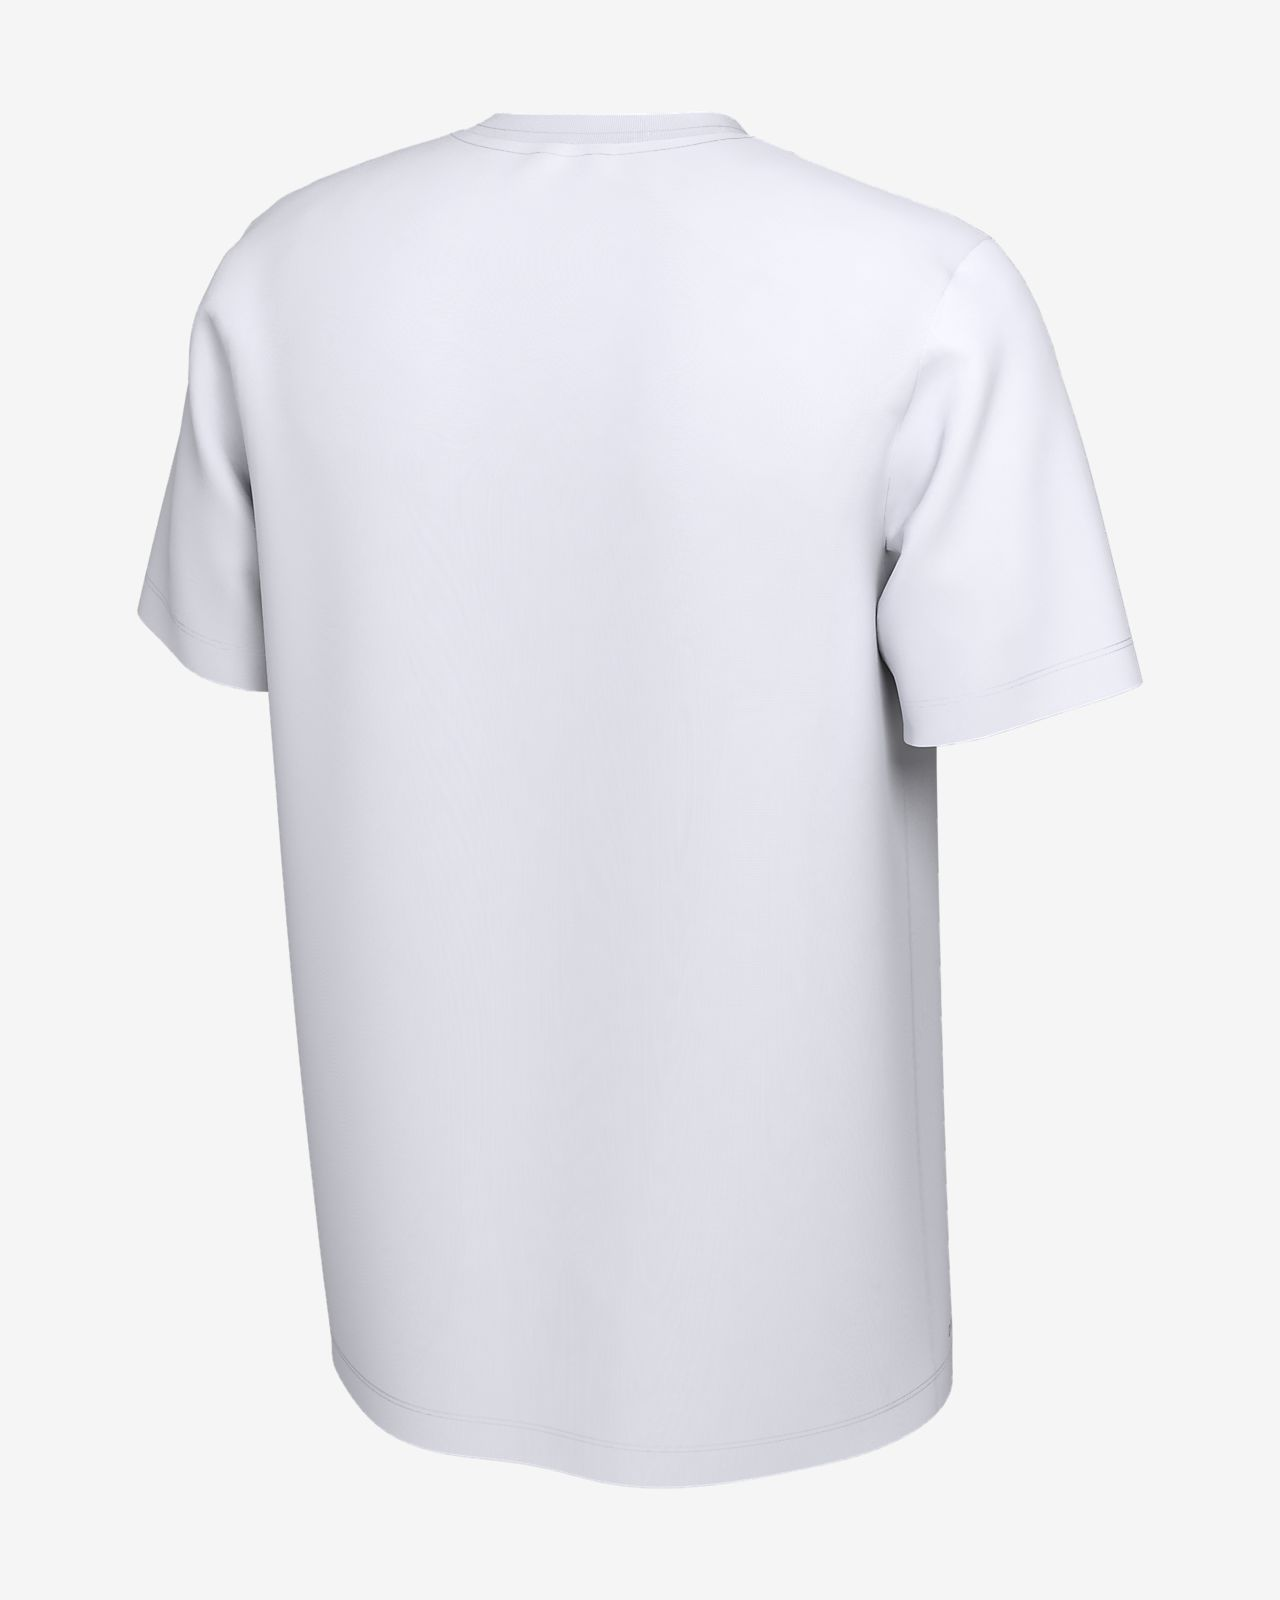 fa777f2f0faa ... Kobe Bryant Los Angeles Lakers Nike Dri-FIT Men s NBA Graphic T-Shirt